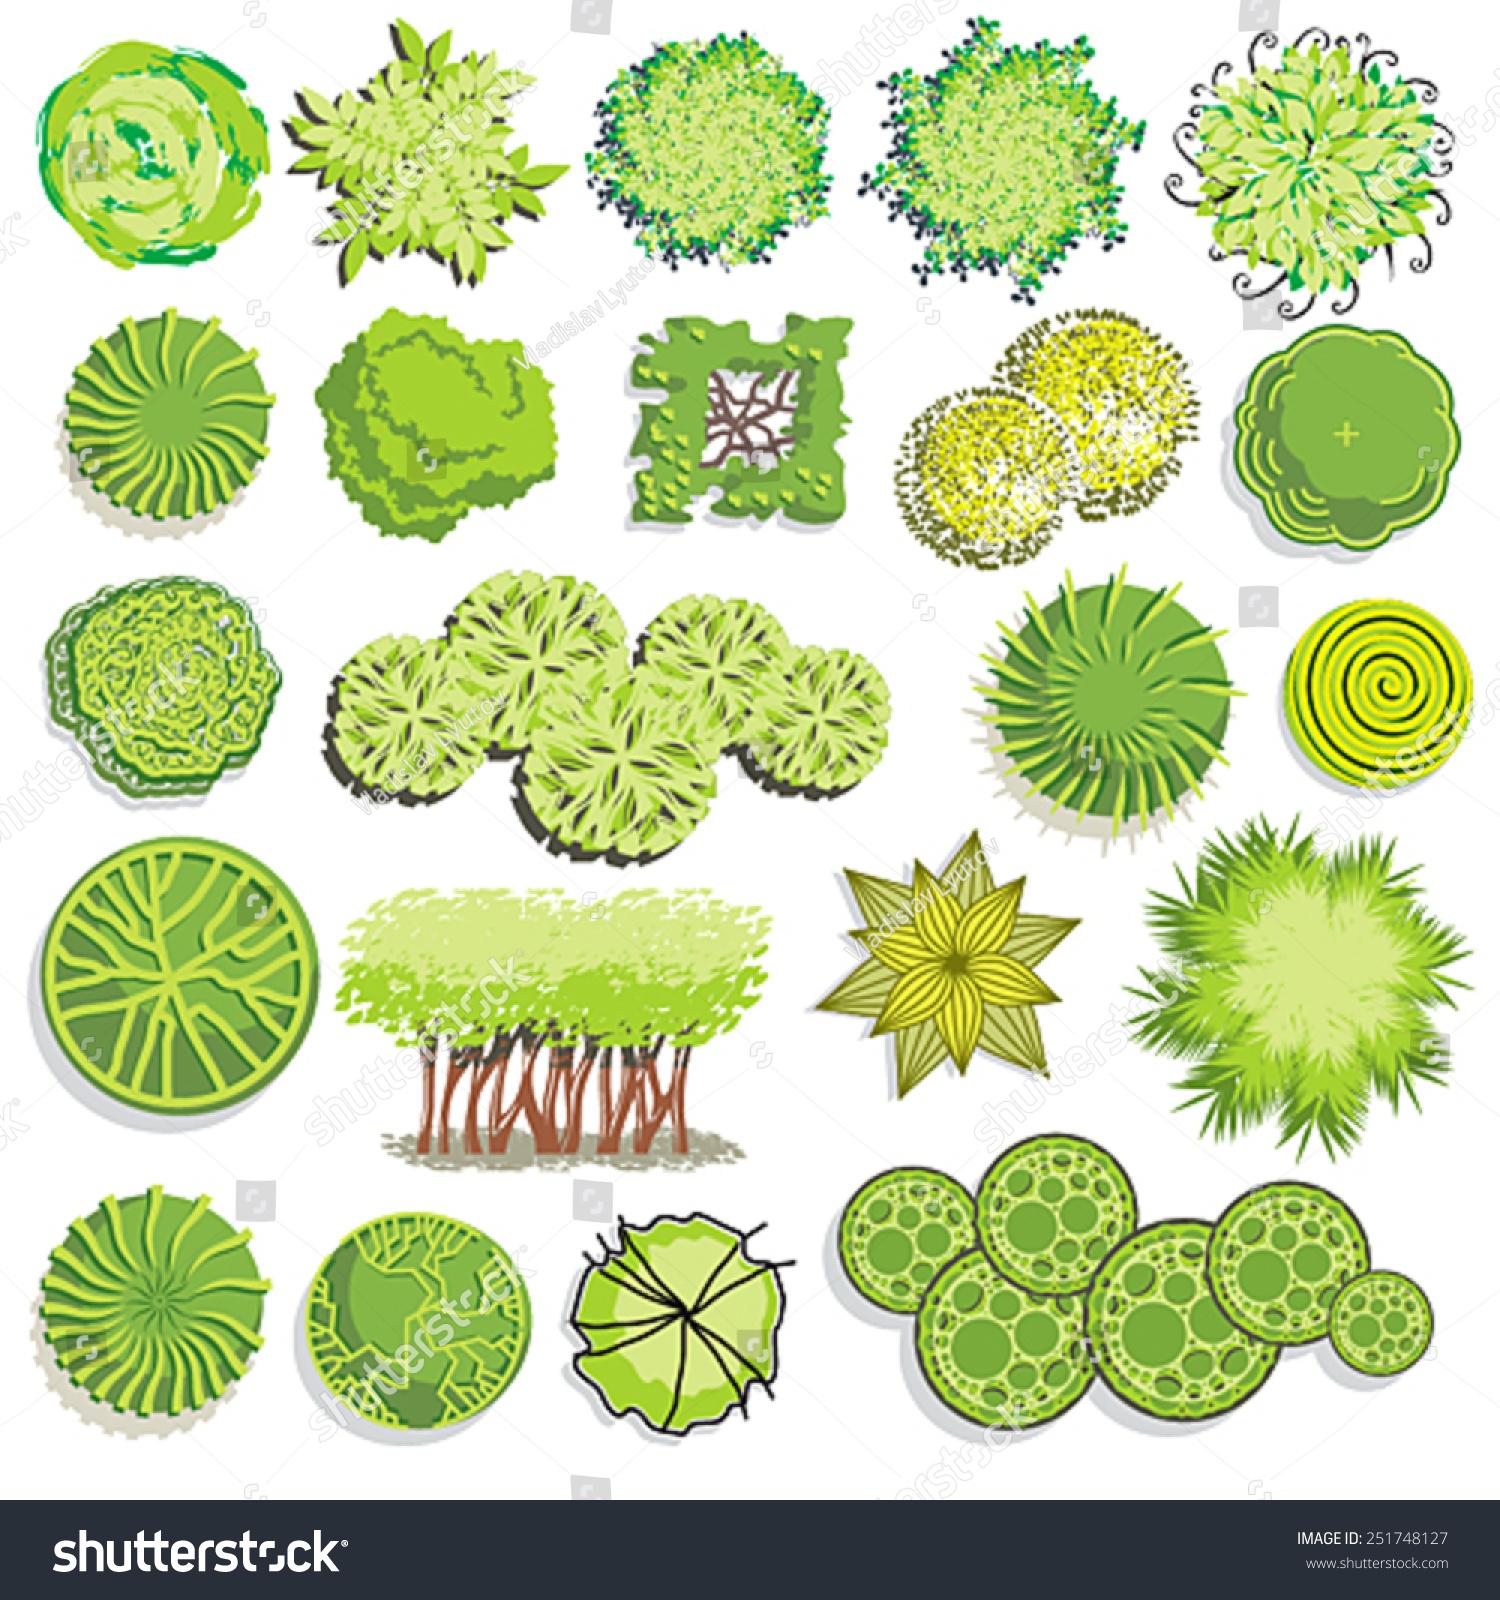 Landscape shrub symbols 875685 for Top view design